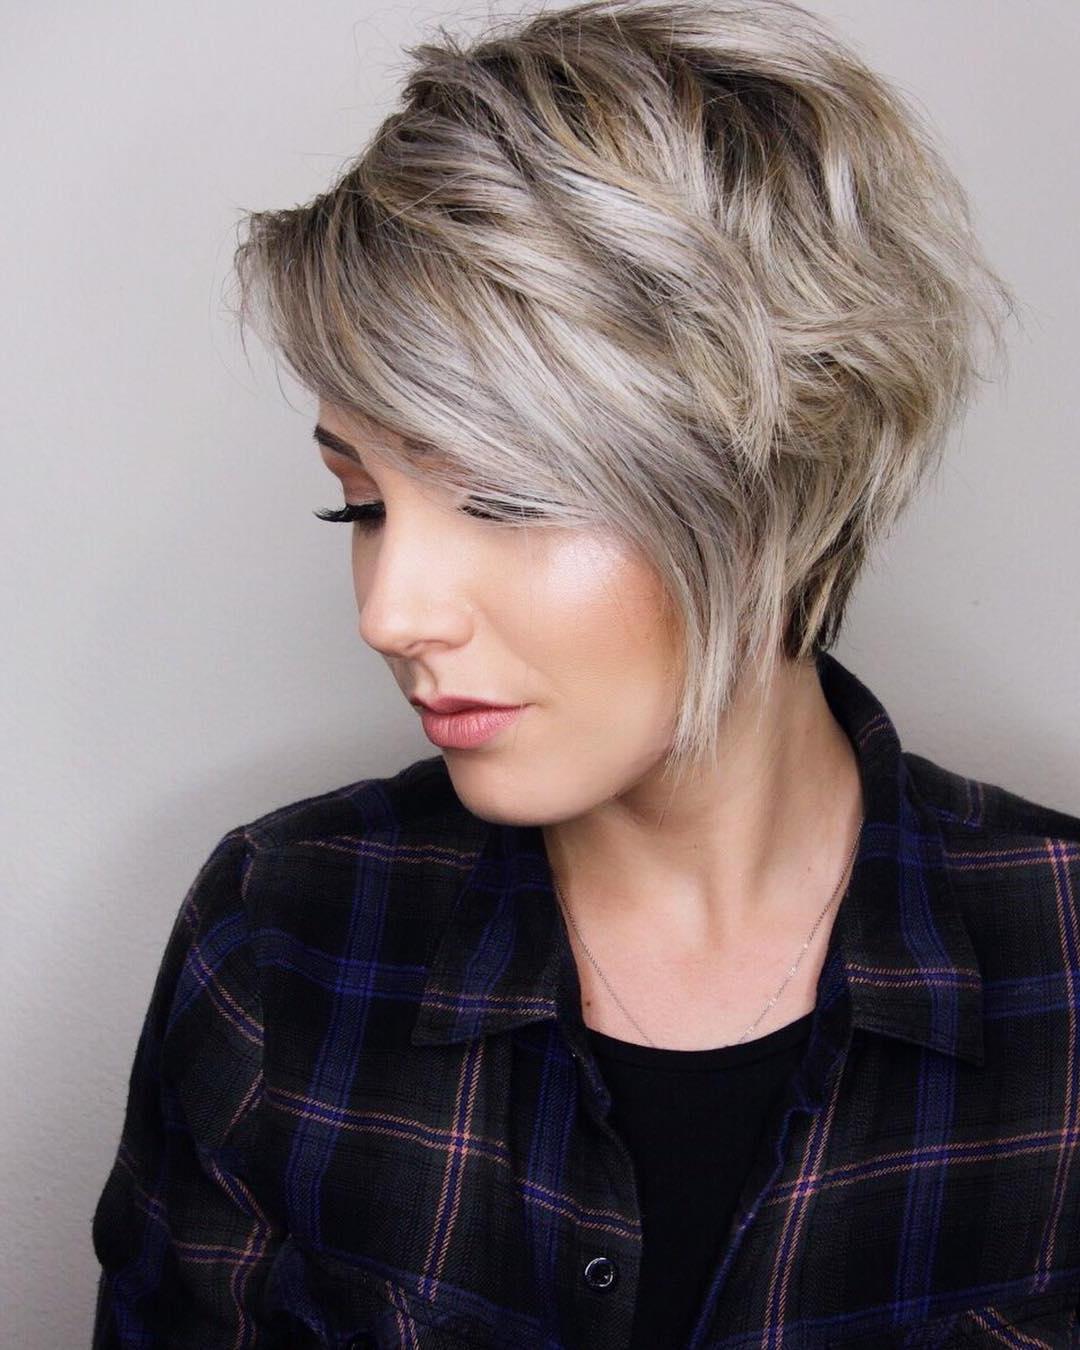 10 Trendy Layered Short Haircut Ideas For 2017 2018 – 'extra Regarding Asymmetric Short Haircuts (View 15 of 25)